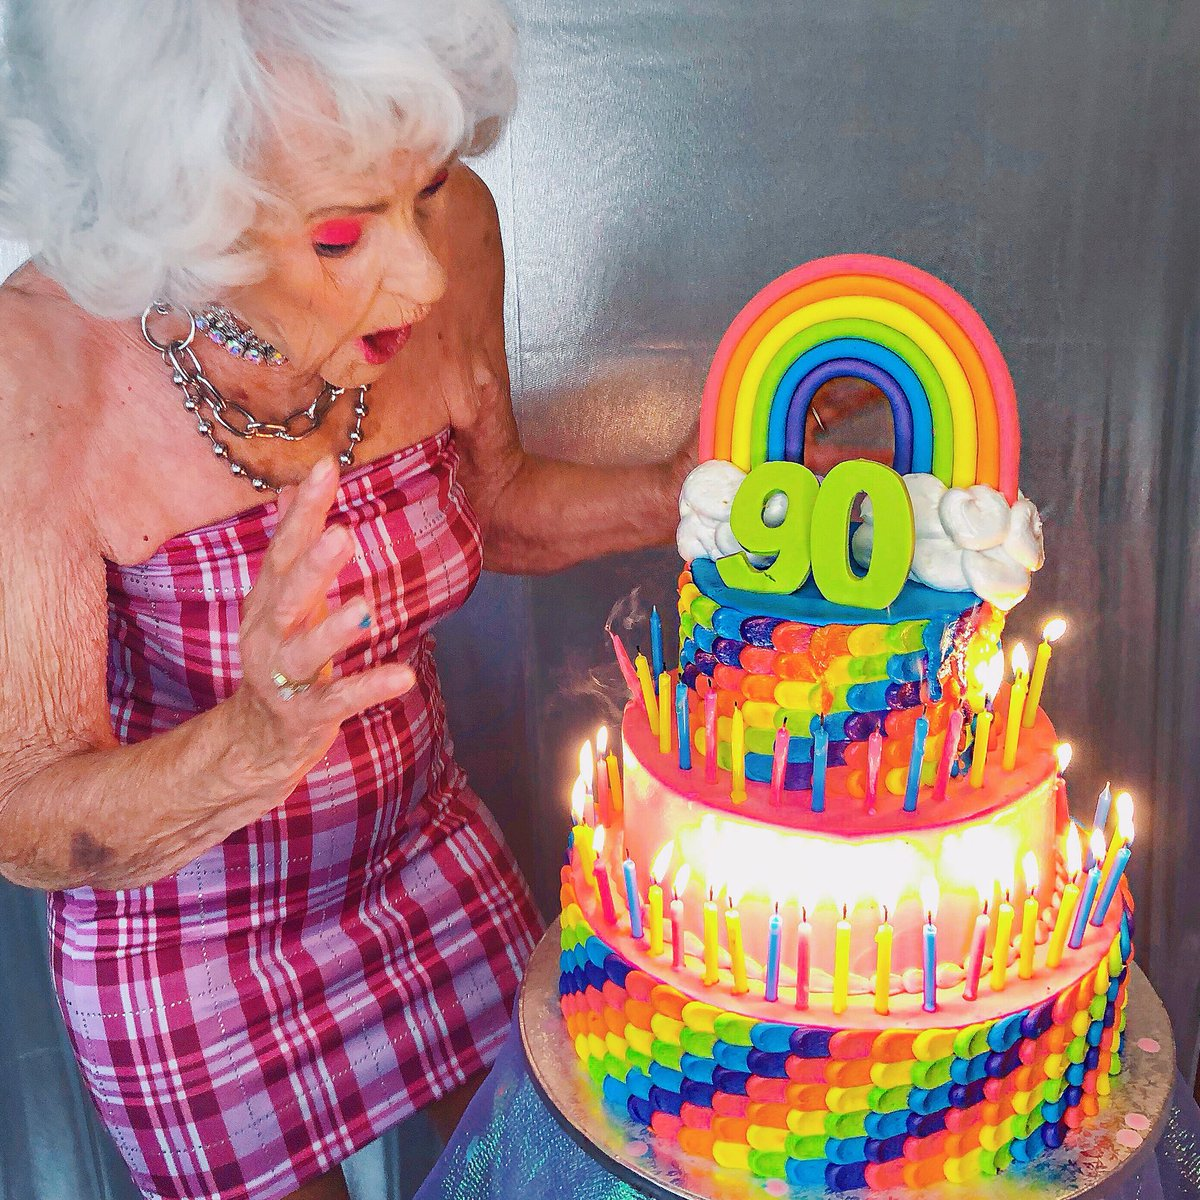 Baddiiiee On Twitter 90 Years Old